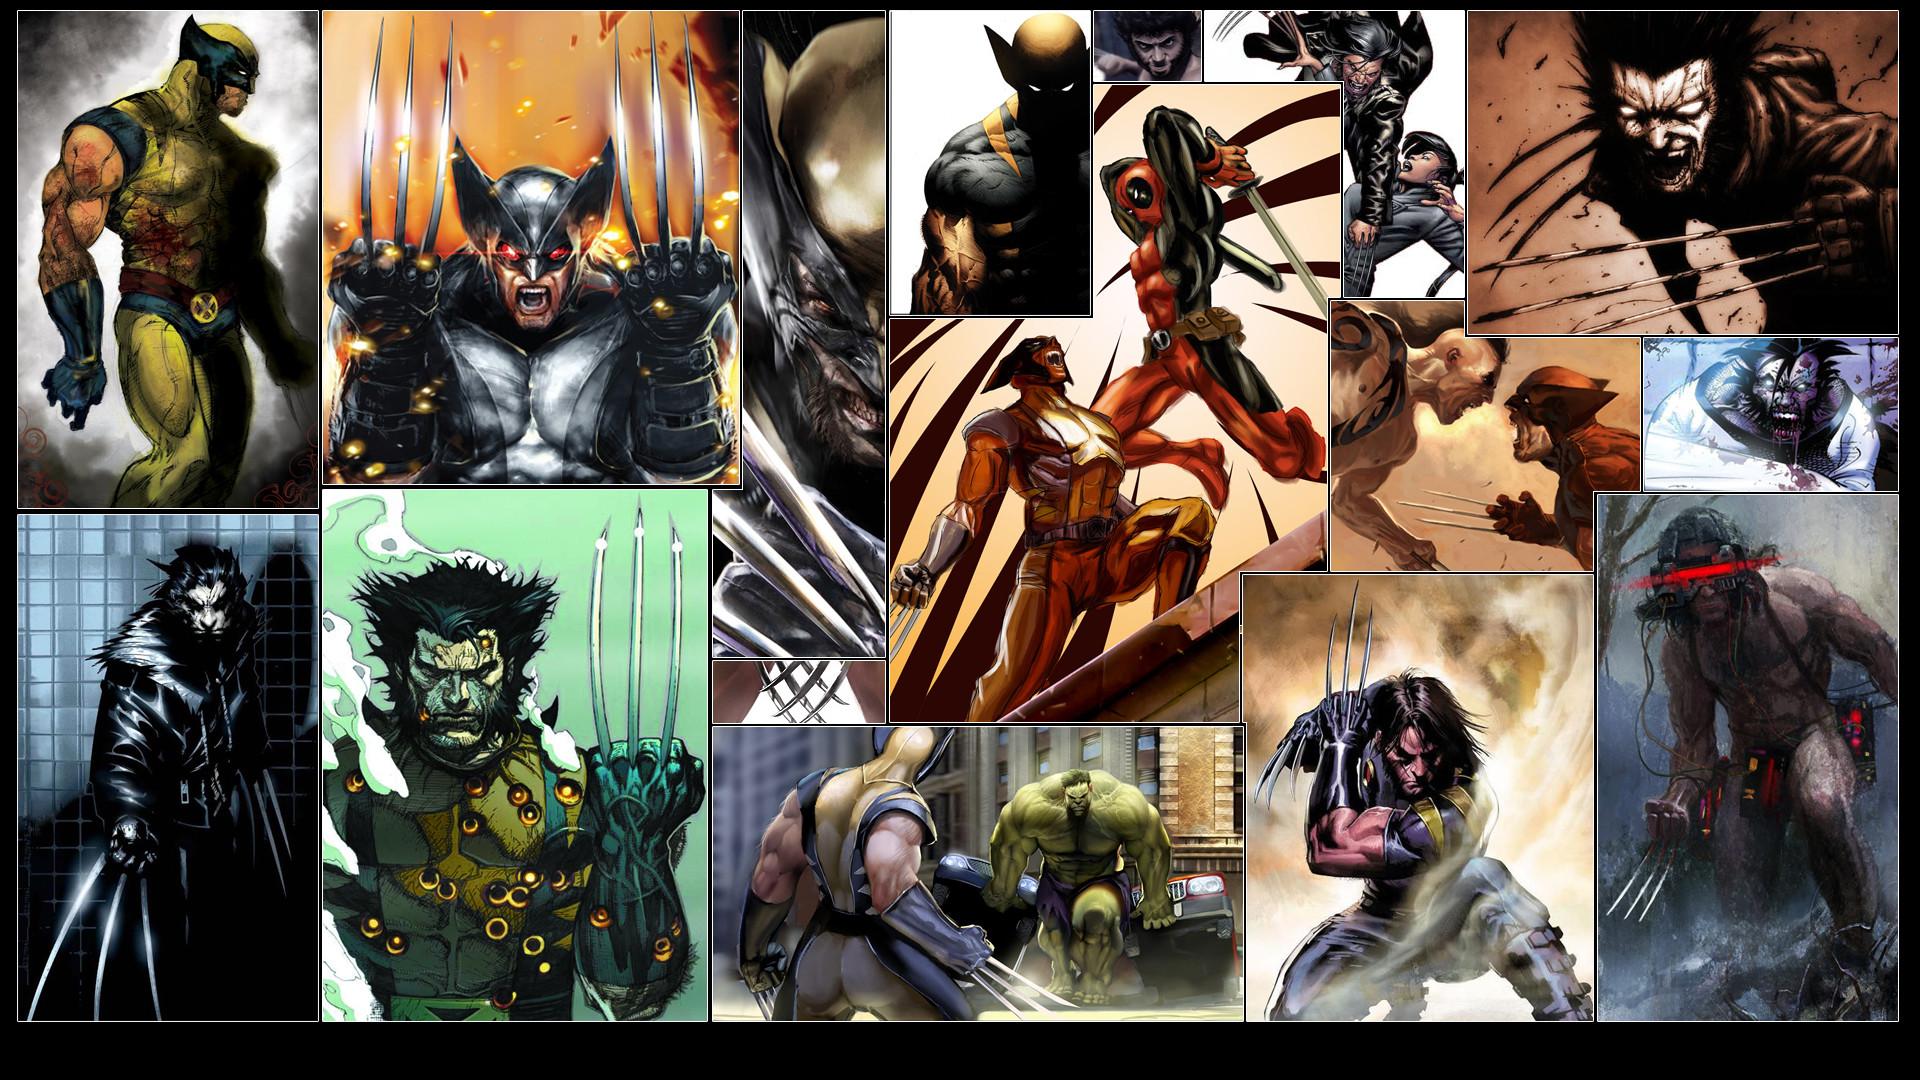 Res: 1920x1080, Comics - Wolverine Deadpool Hulk Wallpaper